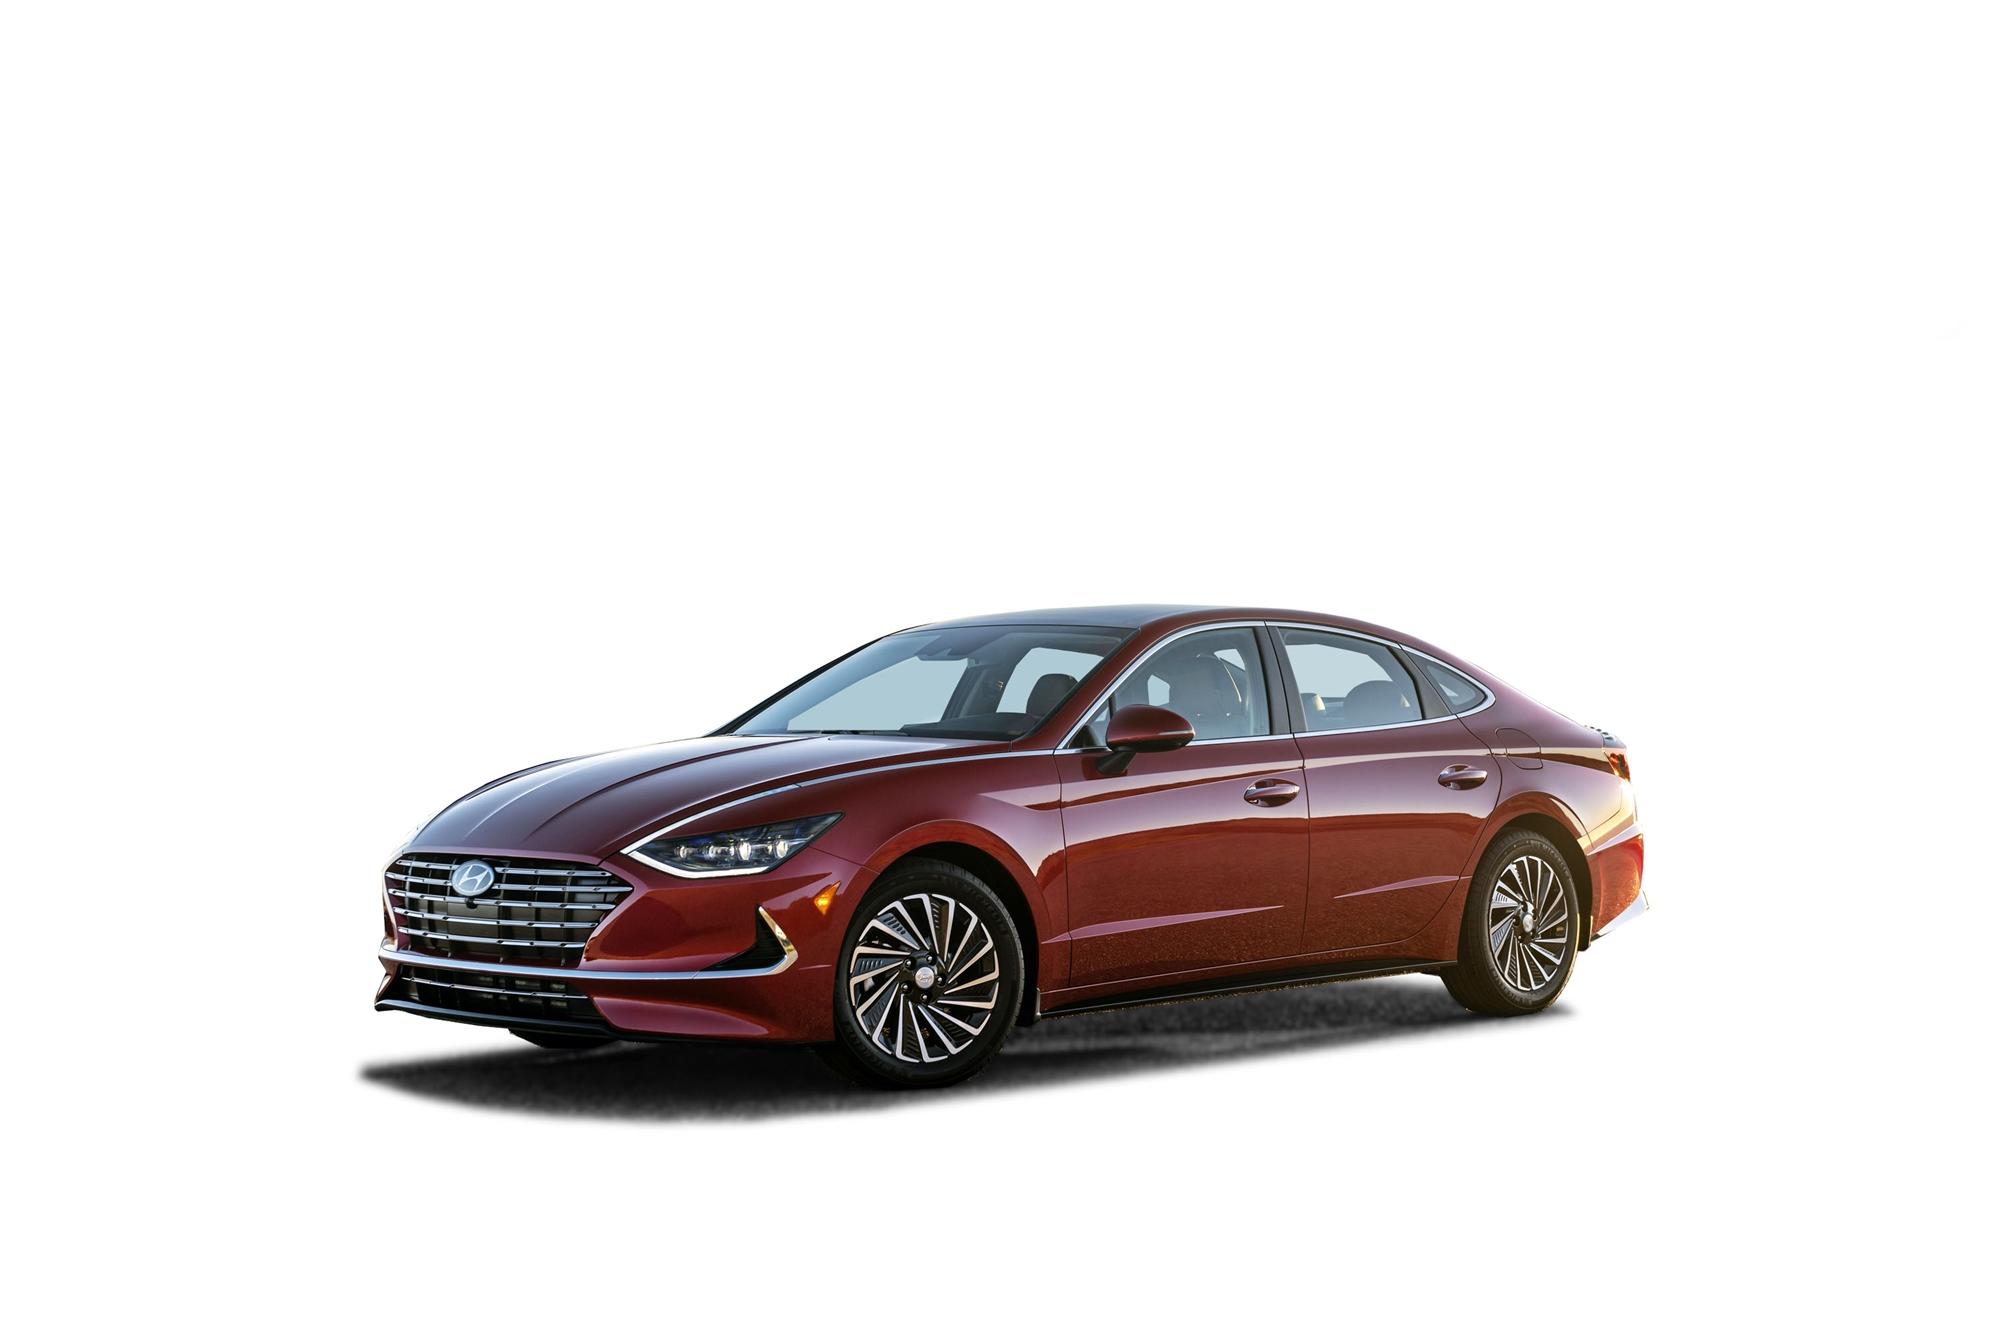 2021 Hyundai Sonata Blue Full Specs, Features and Price ...